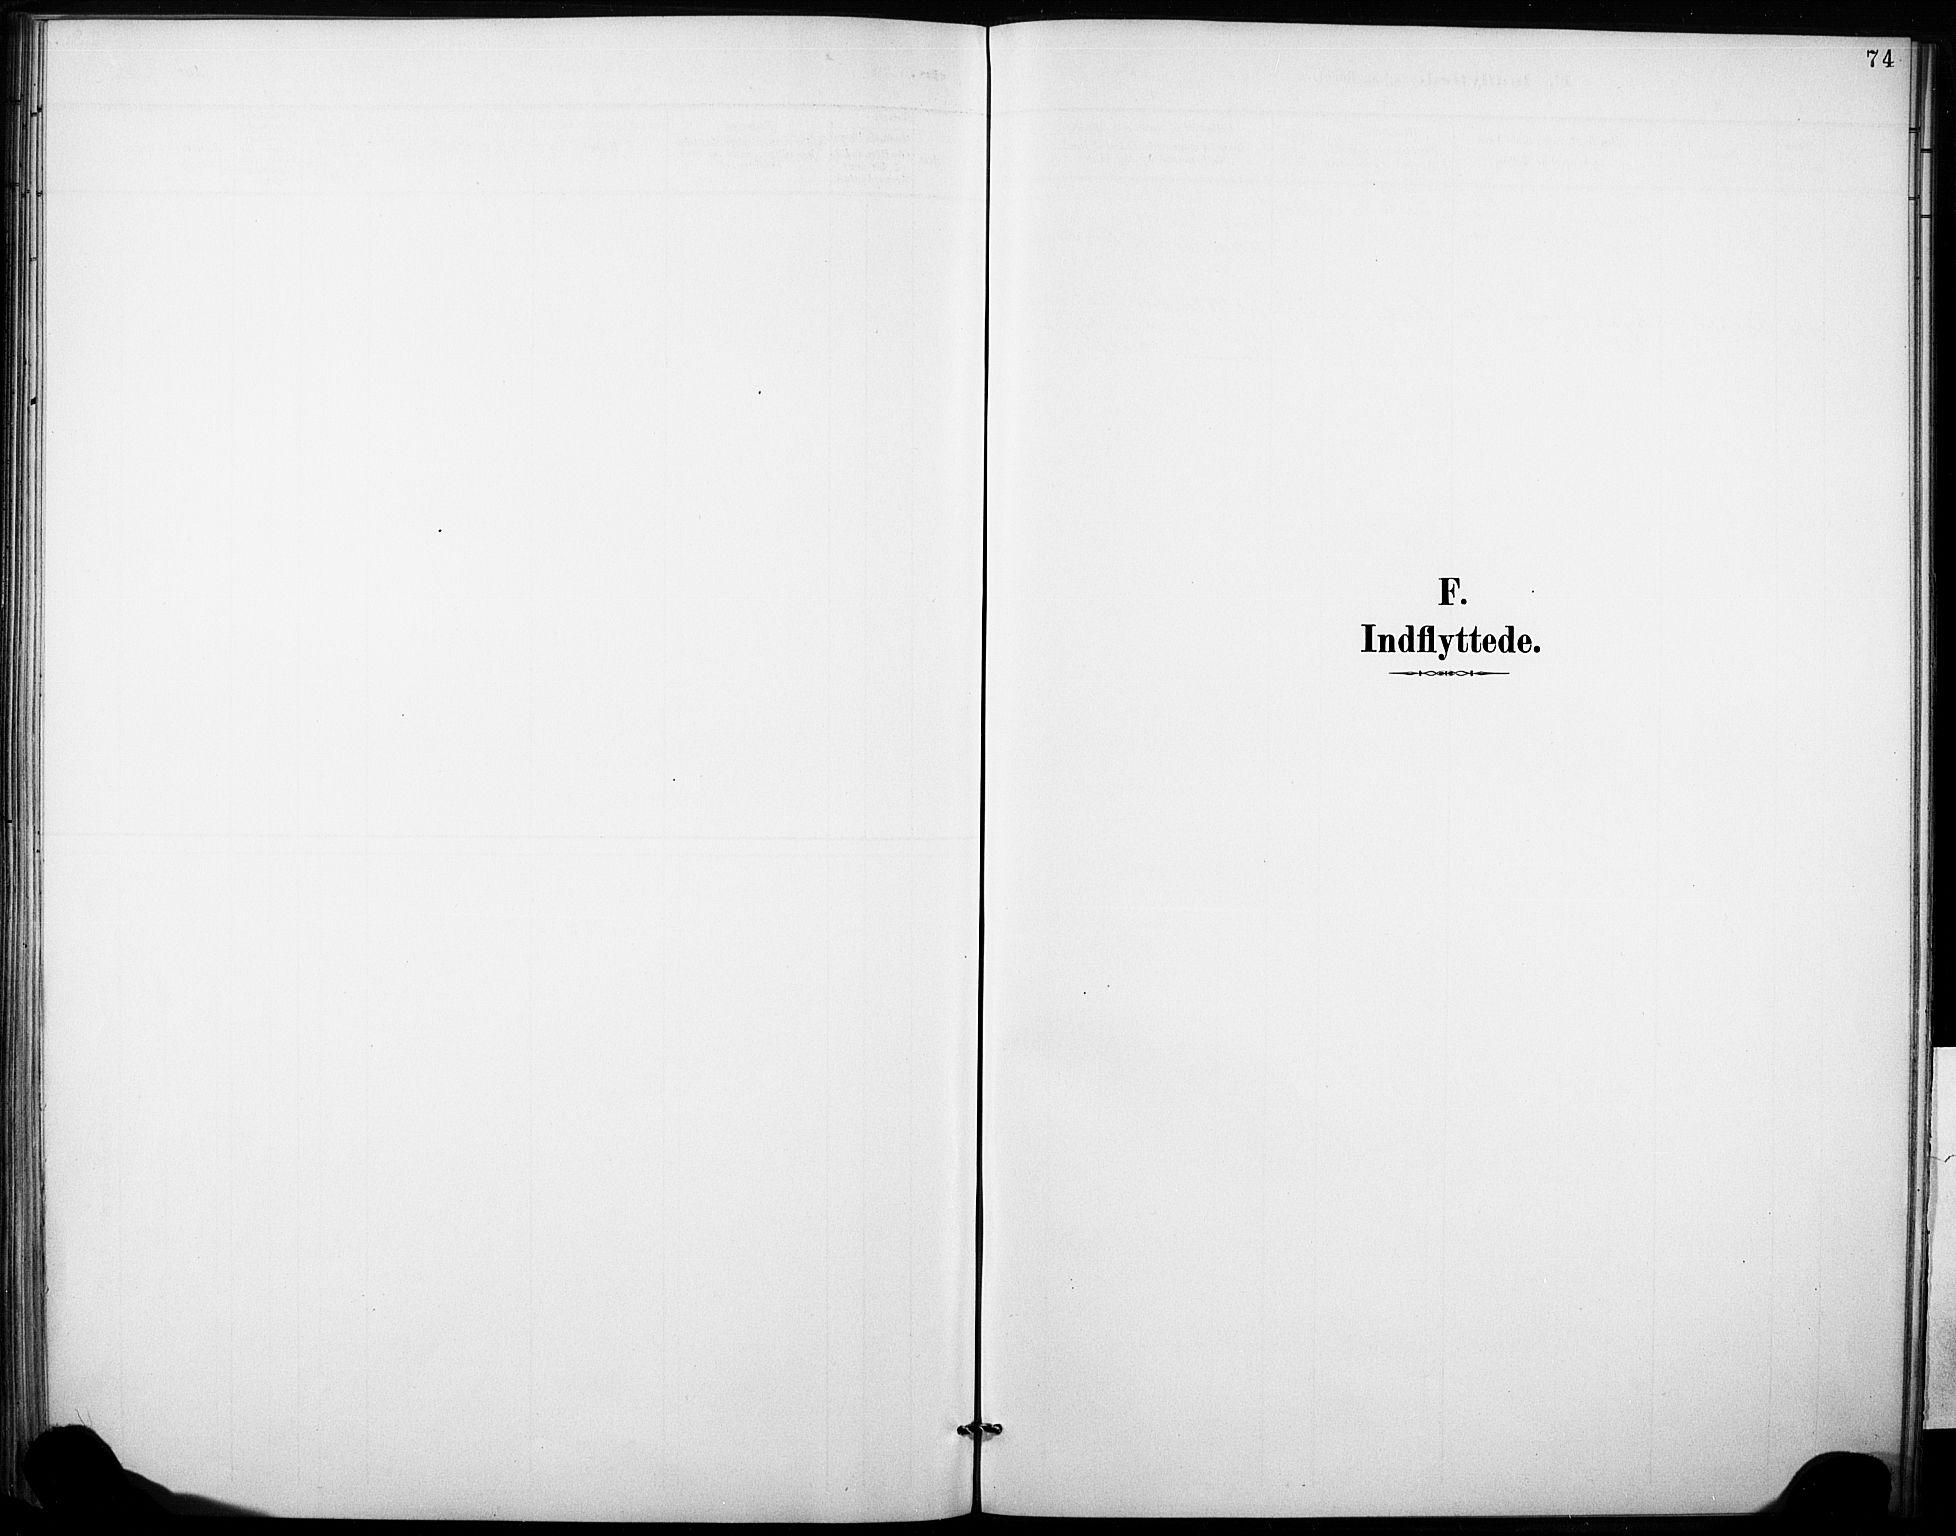 SAKO, Fyresdal kirkebøker, F/Fb/L0003: Parish register (official) no. II 3, 1887-1903, p. 74